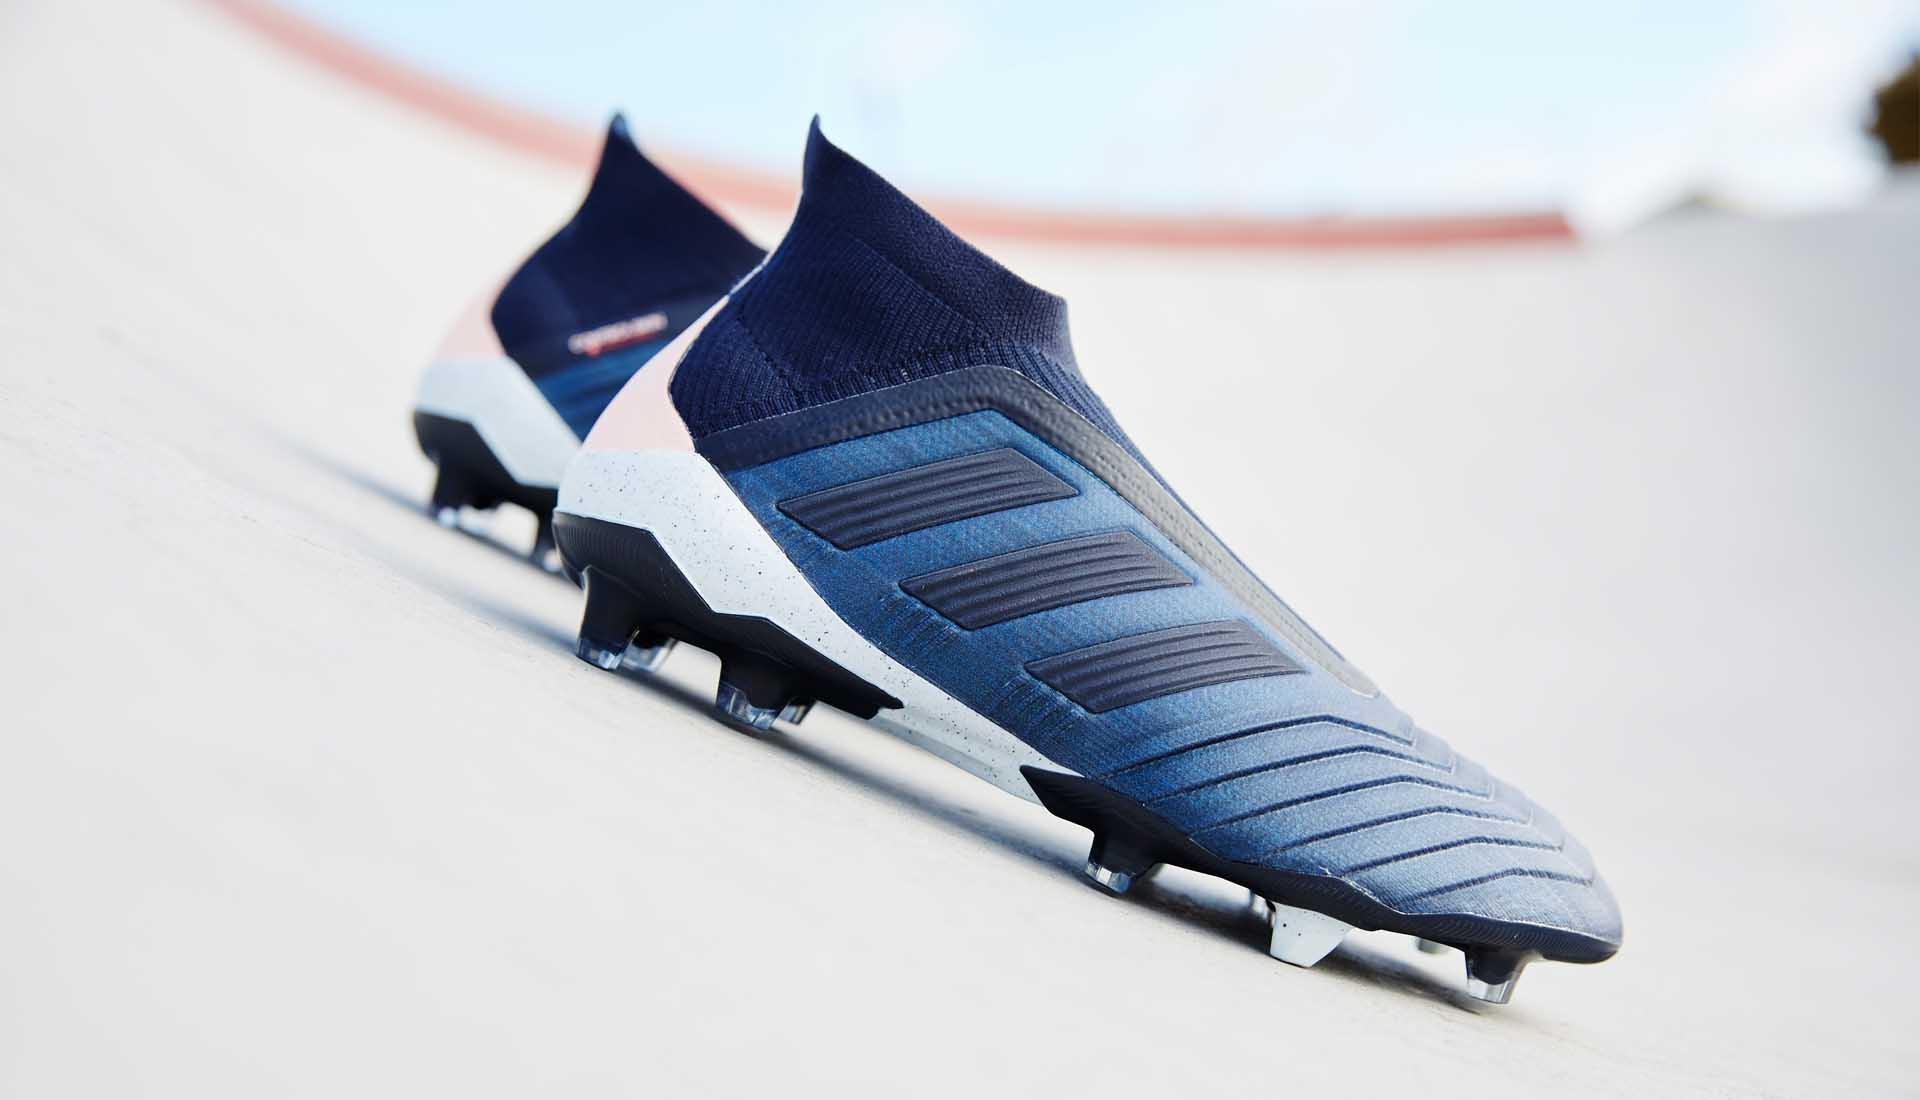 50d35e5aa17 adidas Launch The Predator 18+